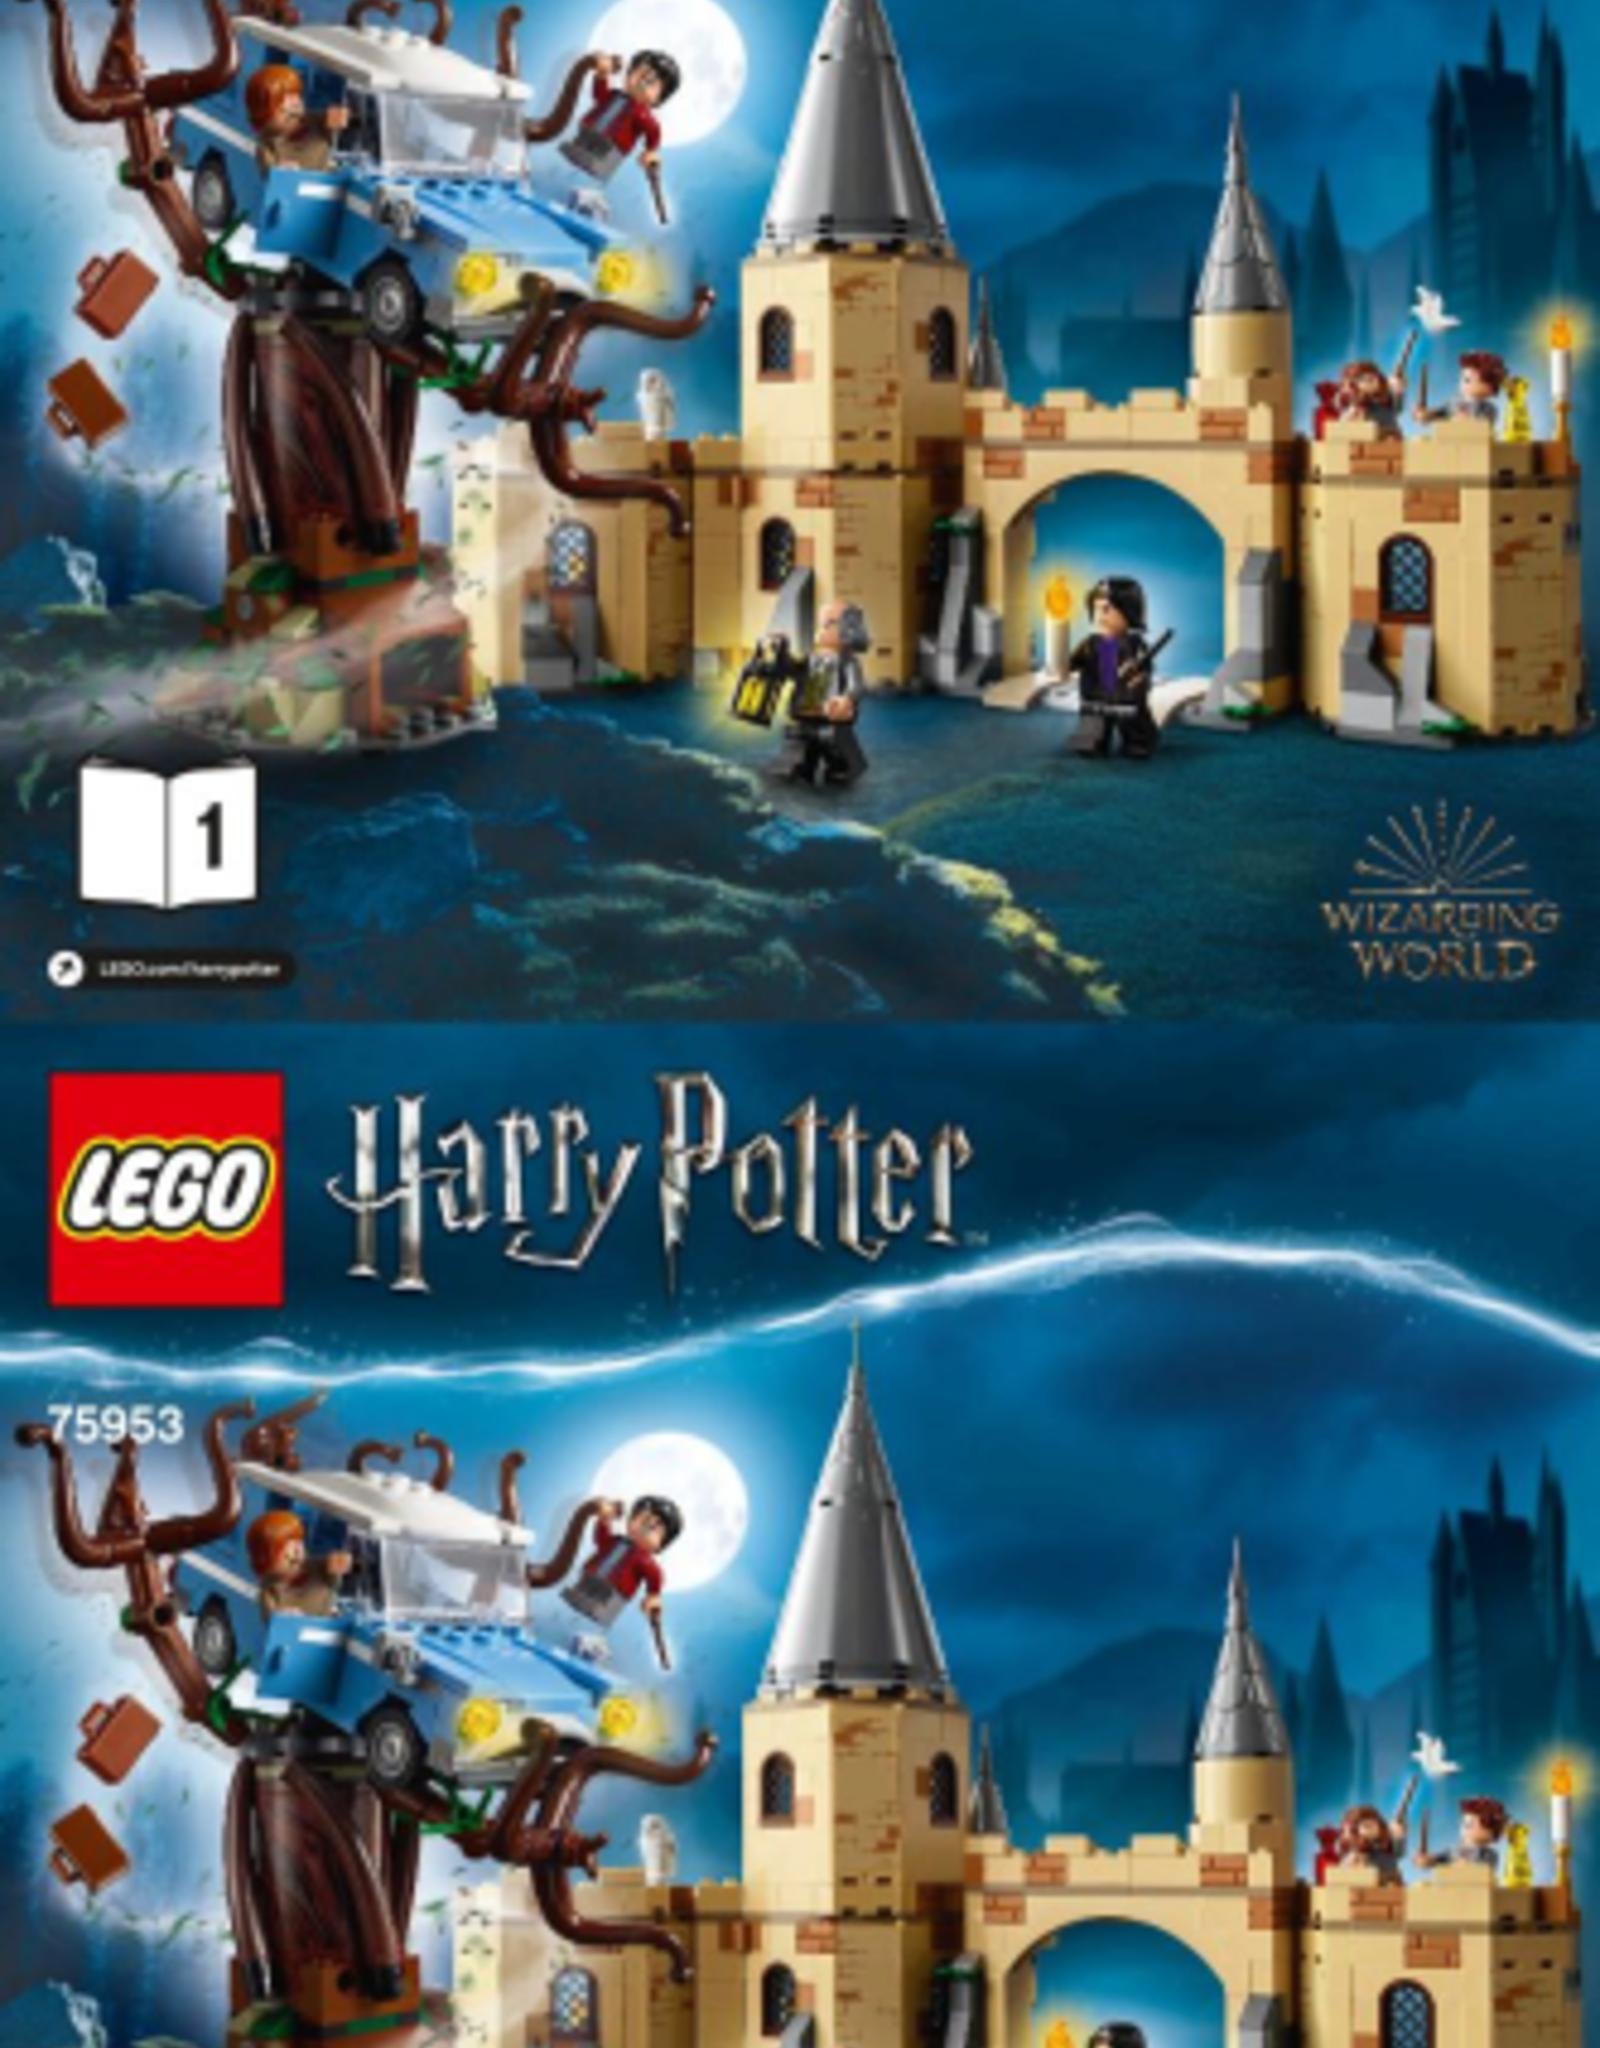 LEGO LEGO 75953 Hogwarts Whomping Willow HARRY POTTER